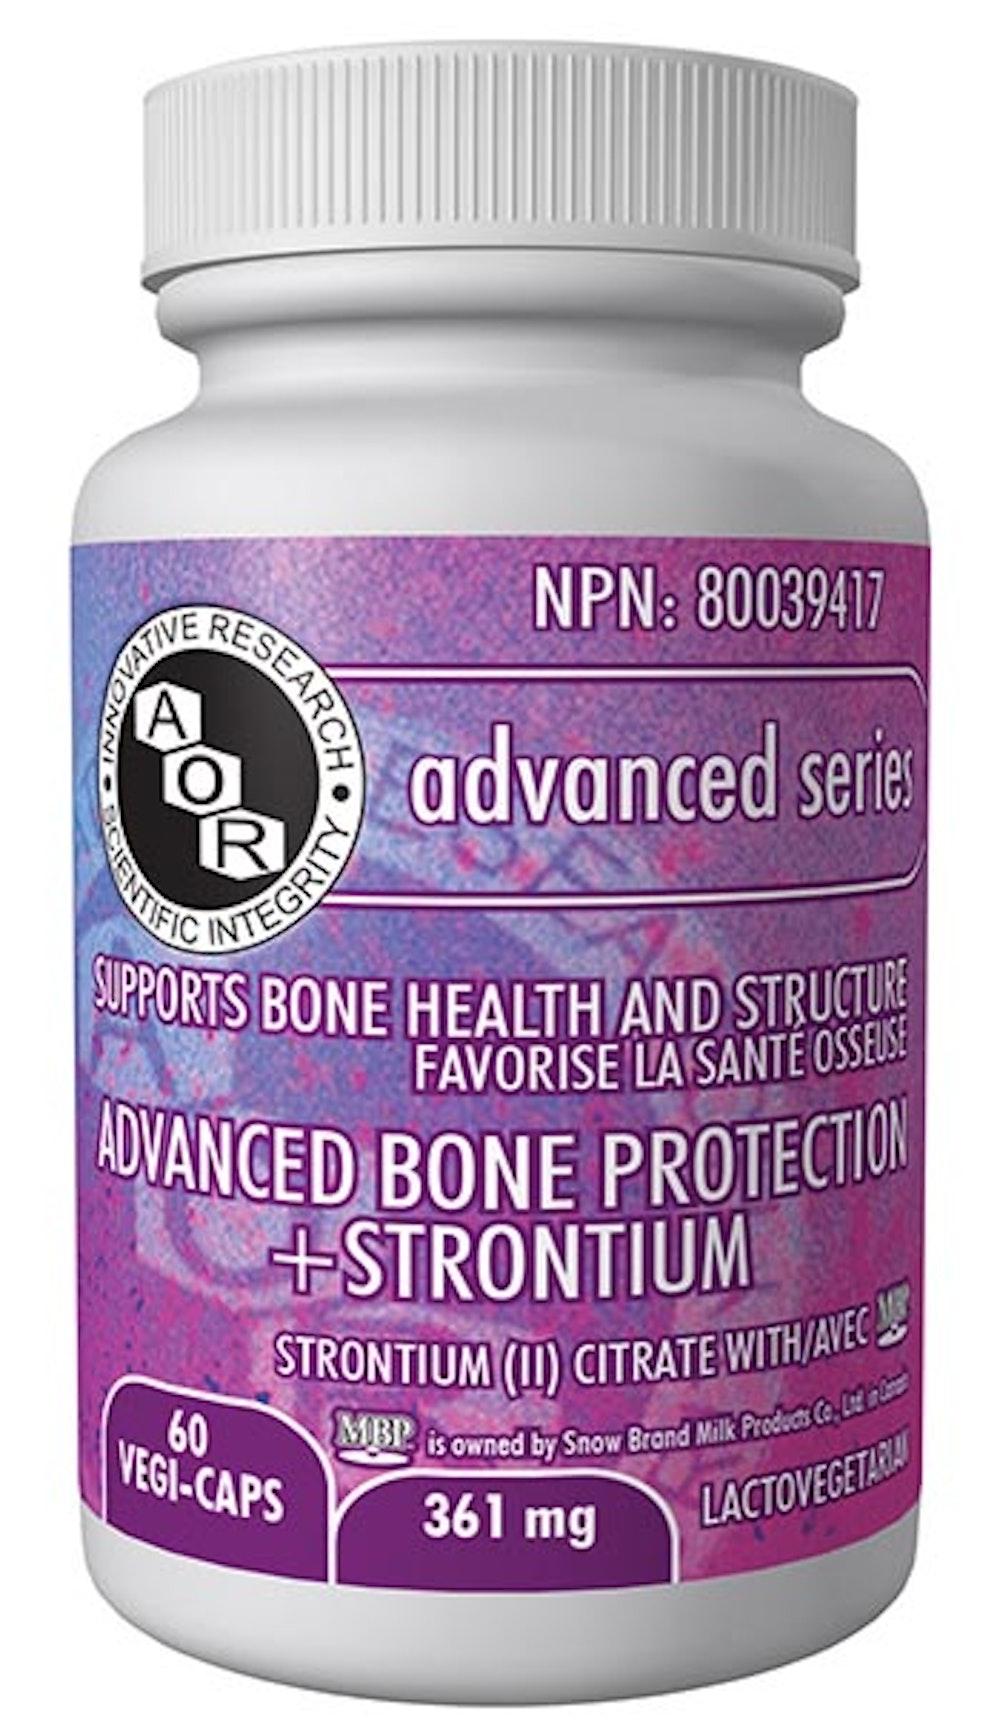 Advanced Bone Protection + Strontium